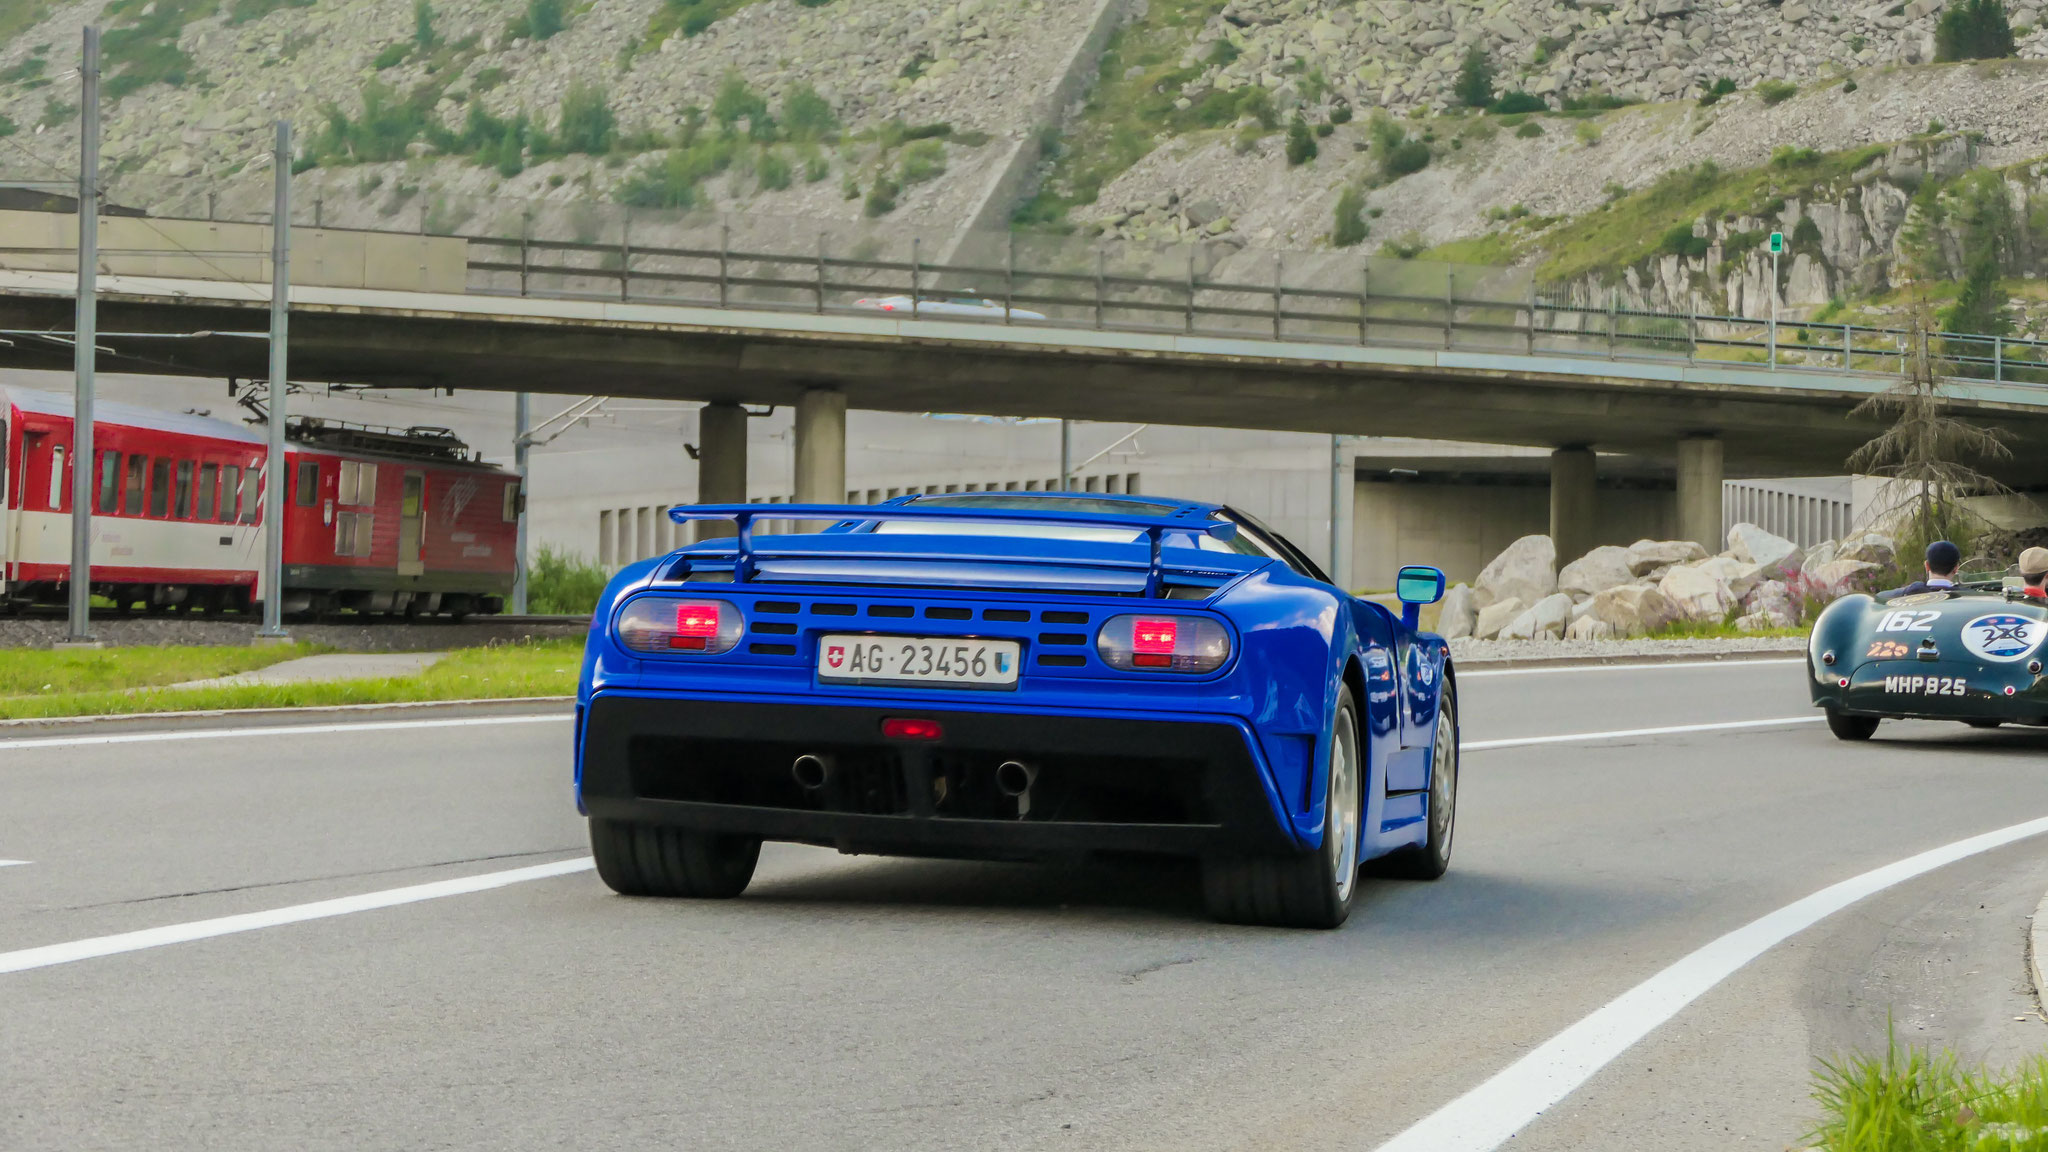 Bugatti EB110 SS - AG-23456 (CH)